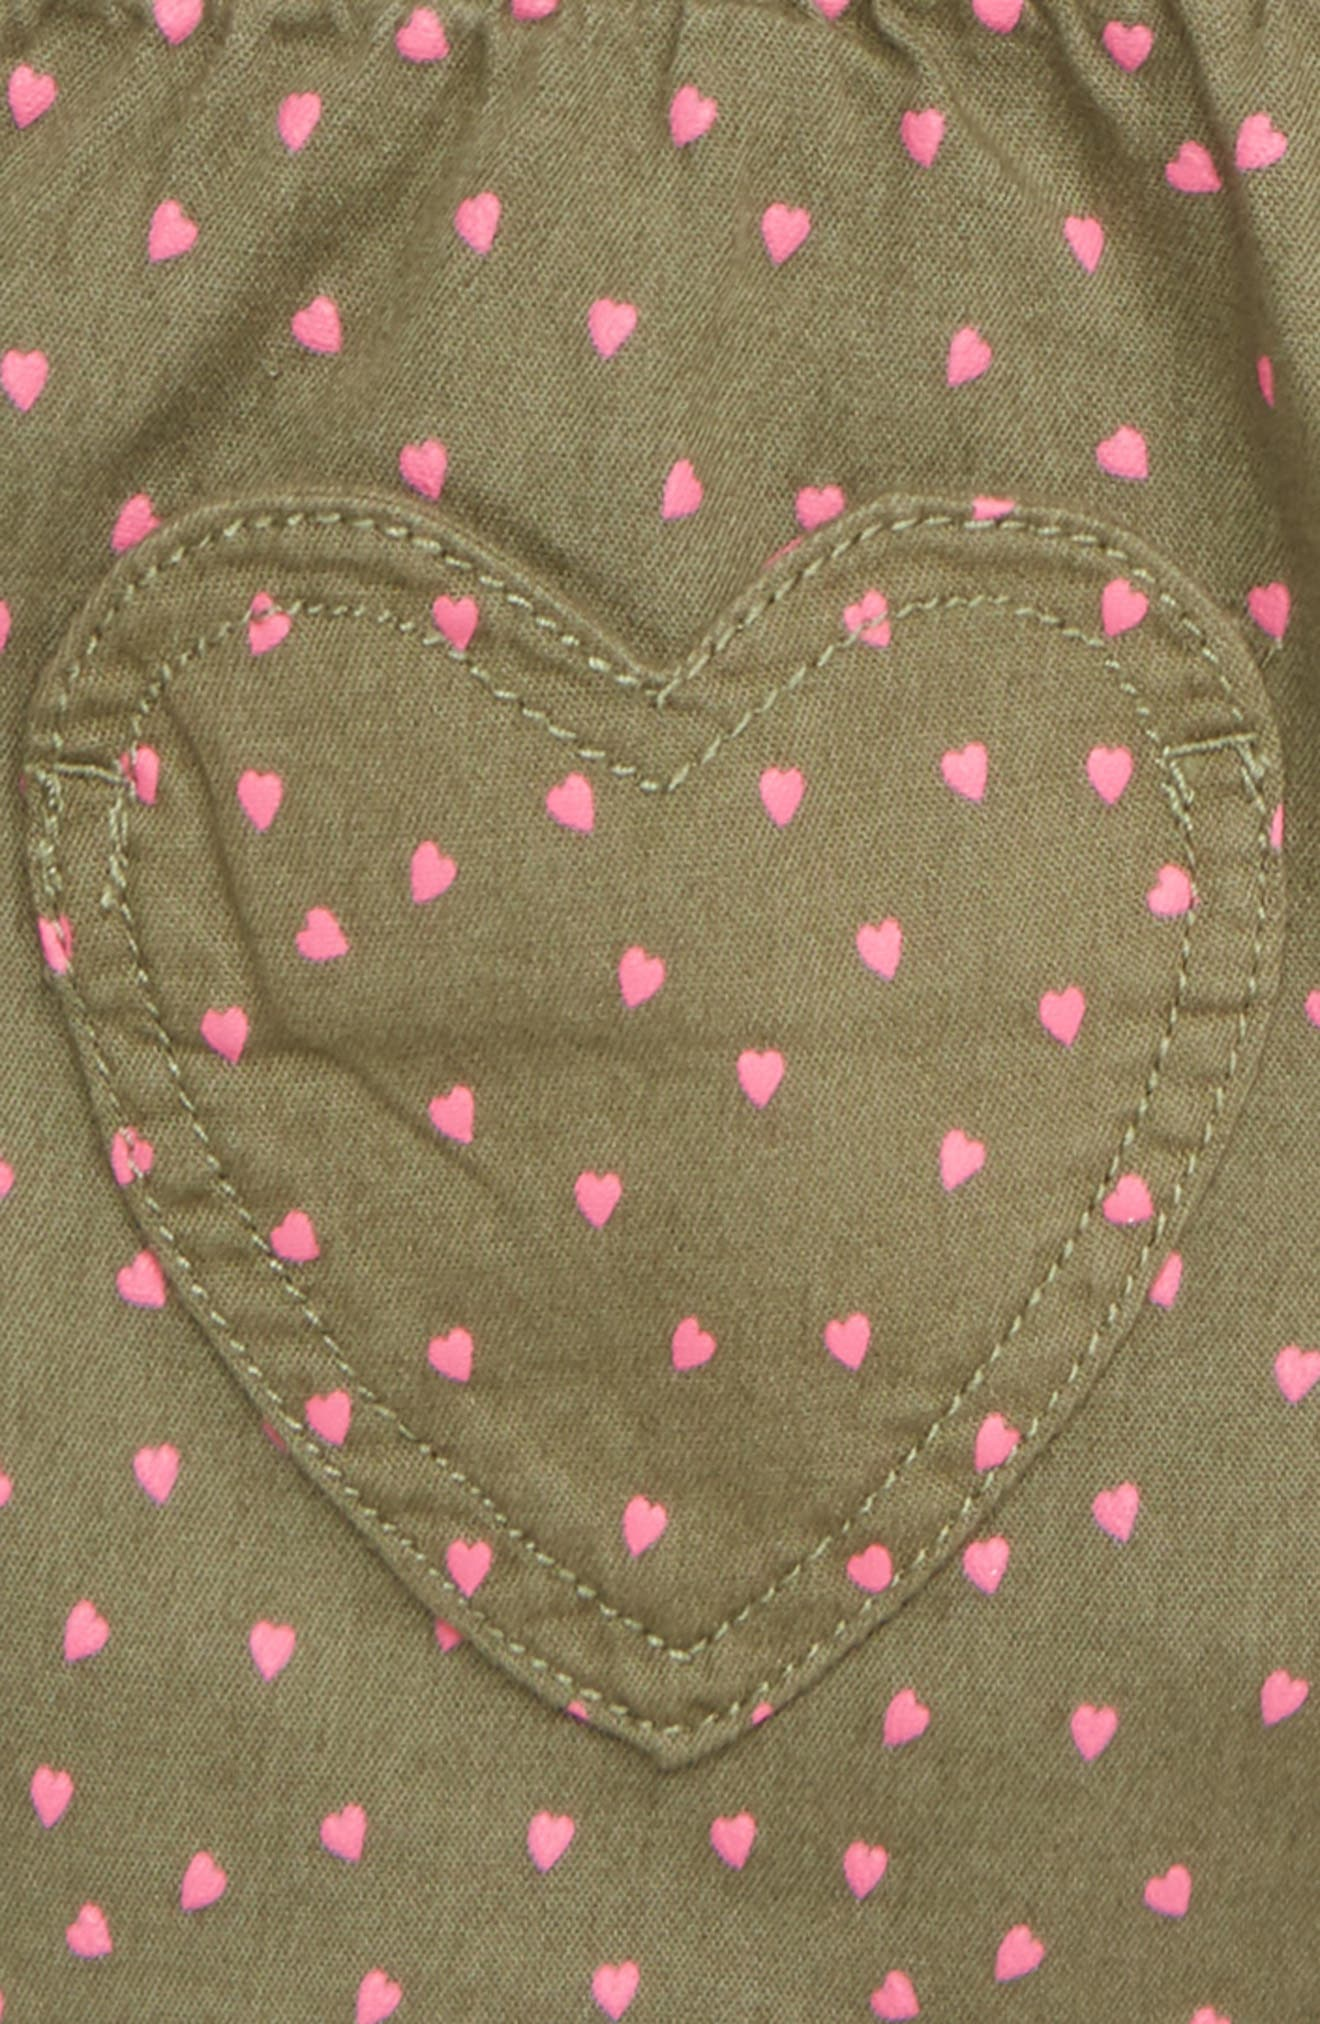 MINI BODEN, Heart Pocket Shorts, Alternate thumbnail 3, color, GRN ARMY GREEN SWEET HEARTS